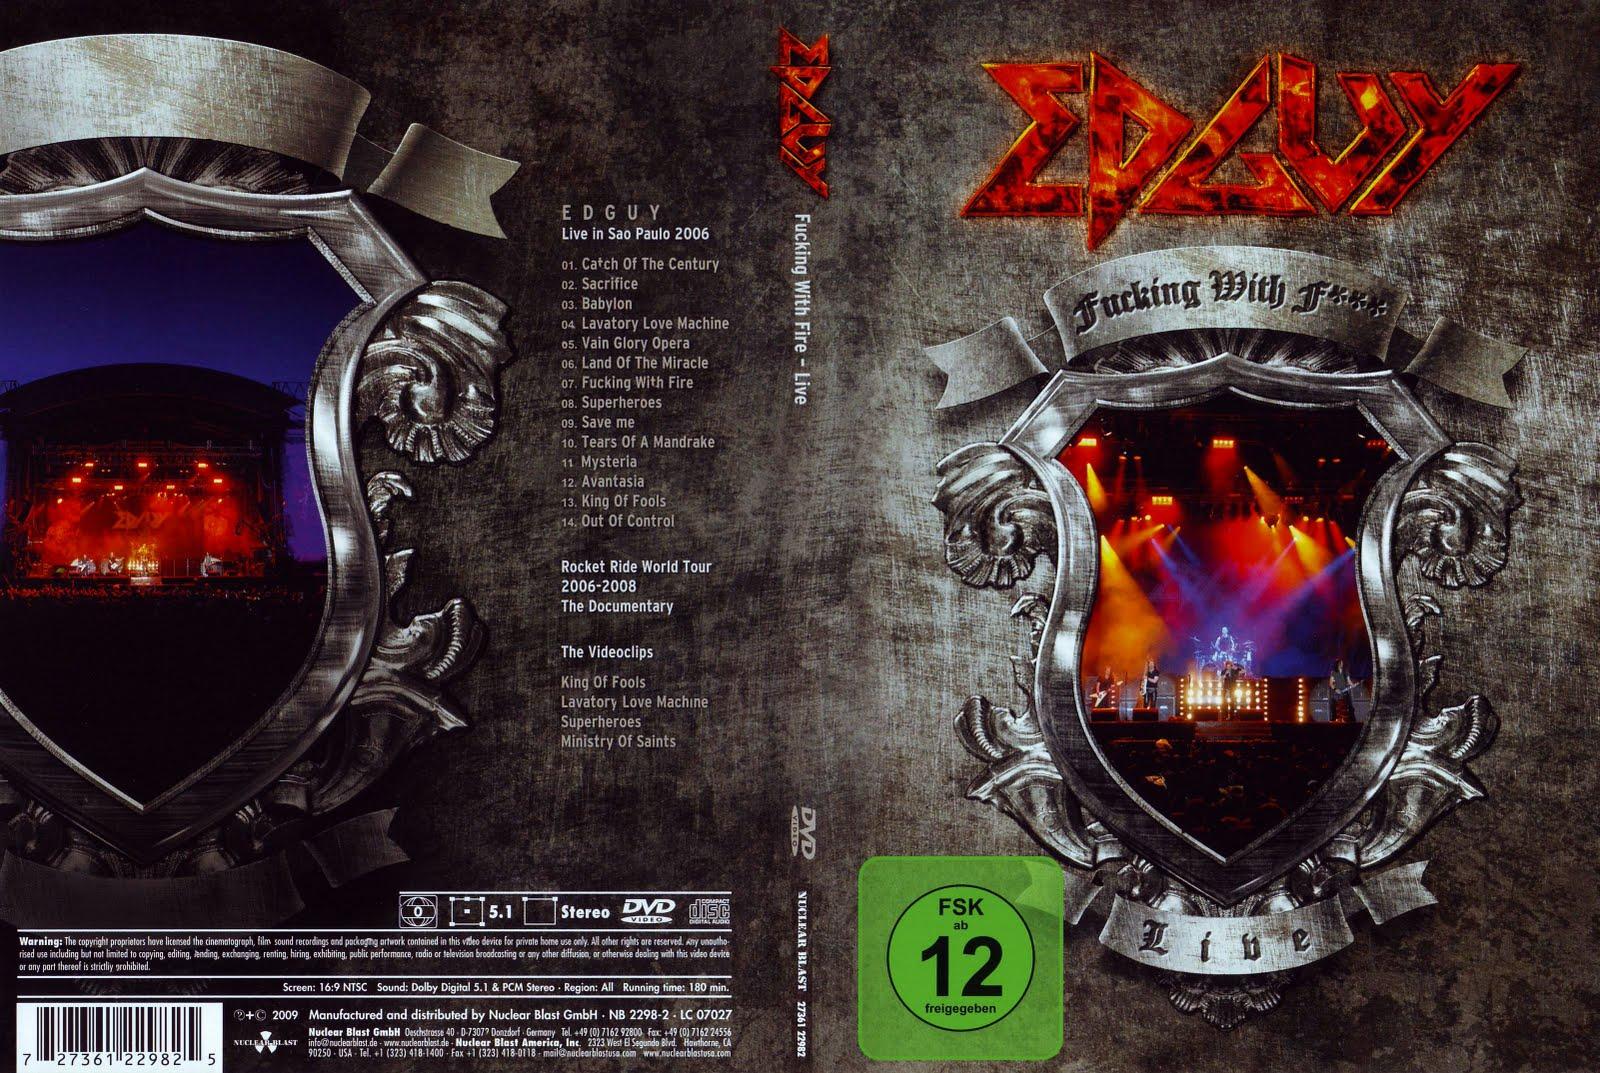 BAIXAR DVD EDGUY